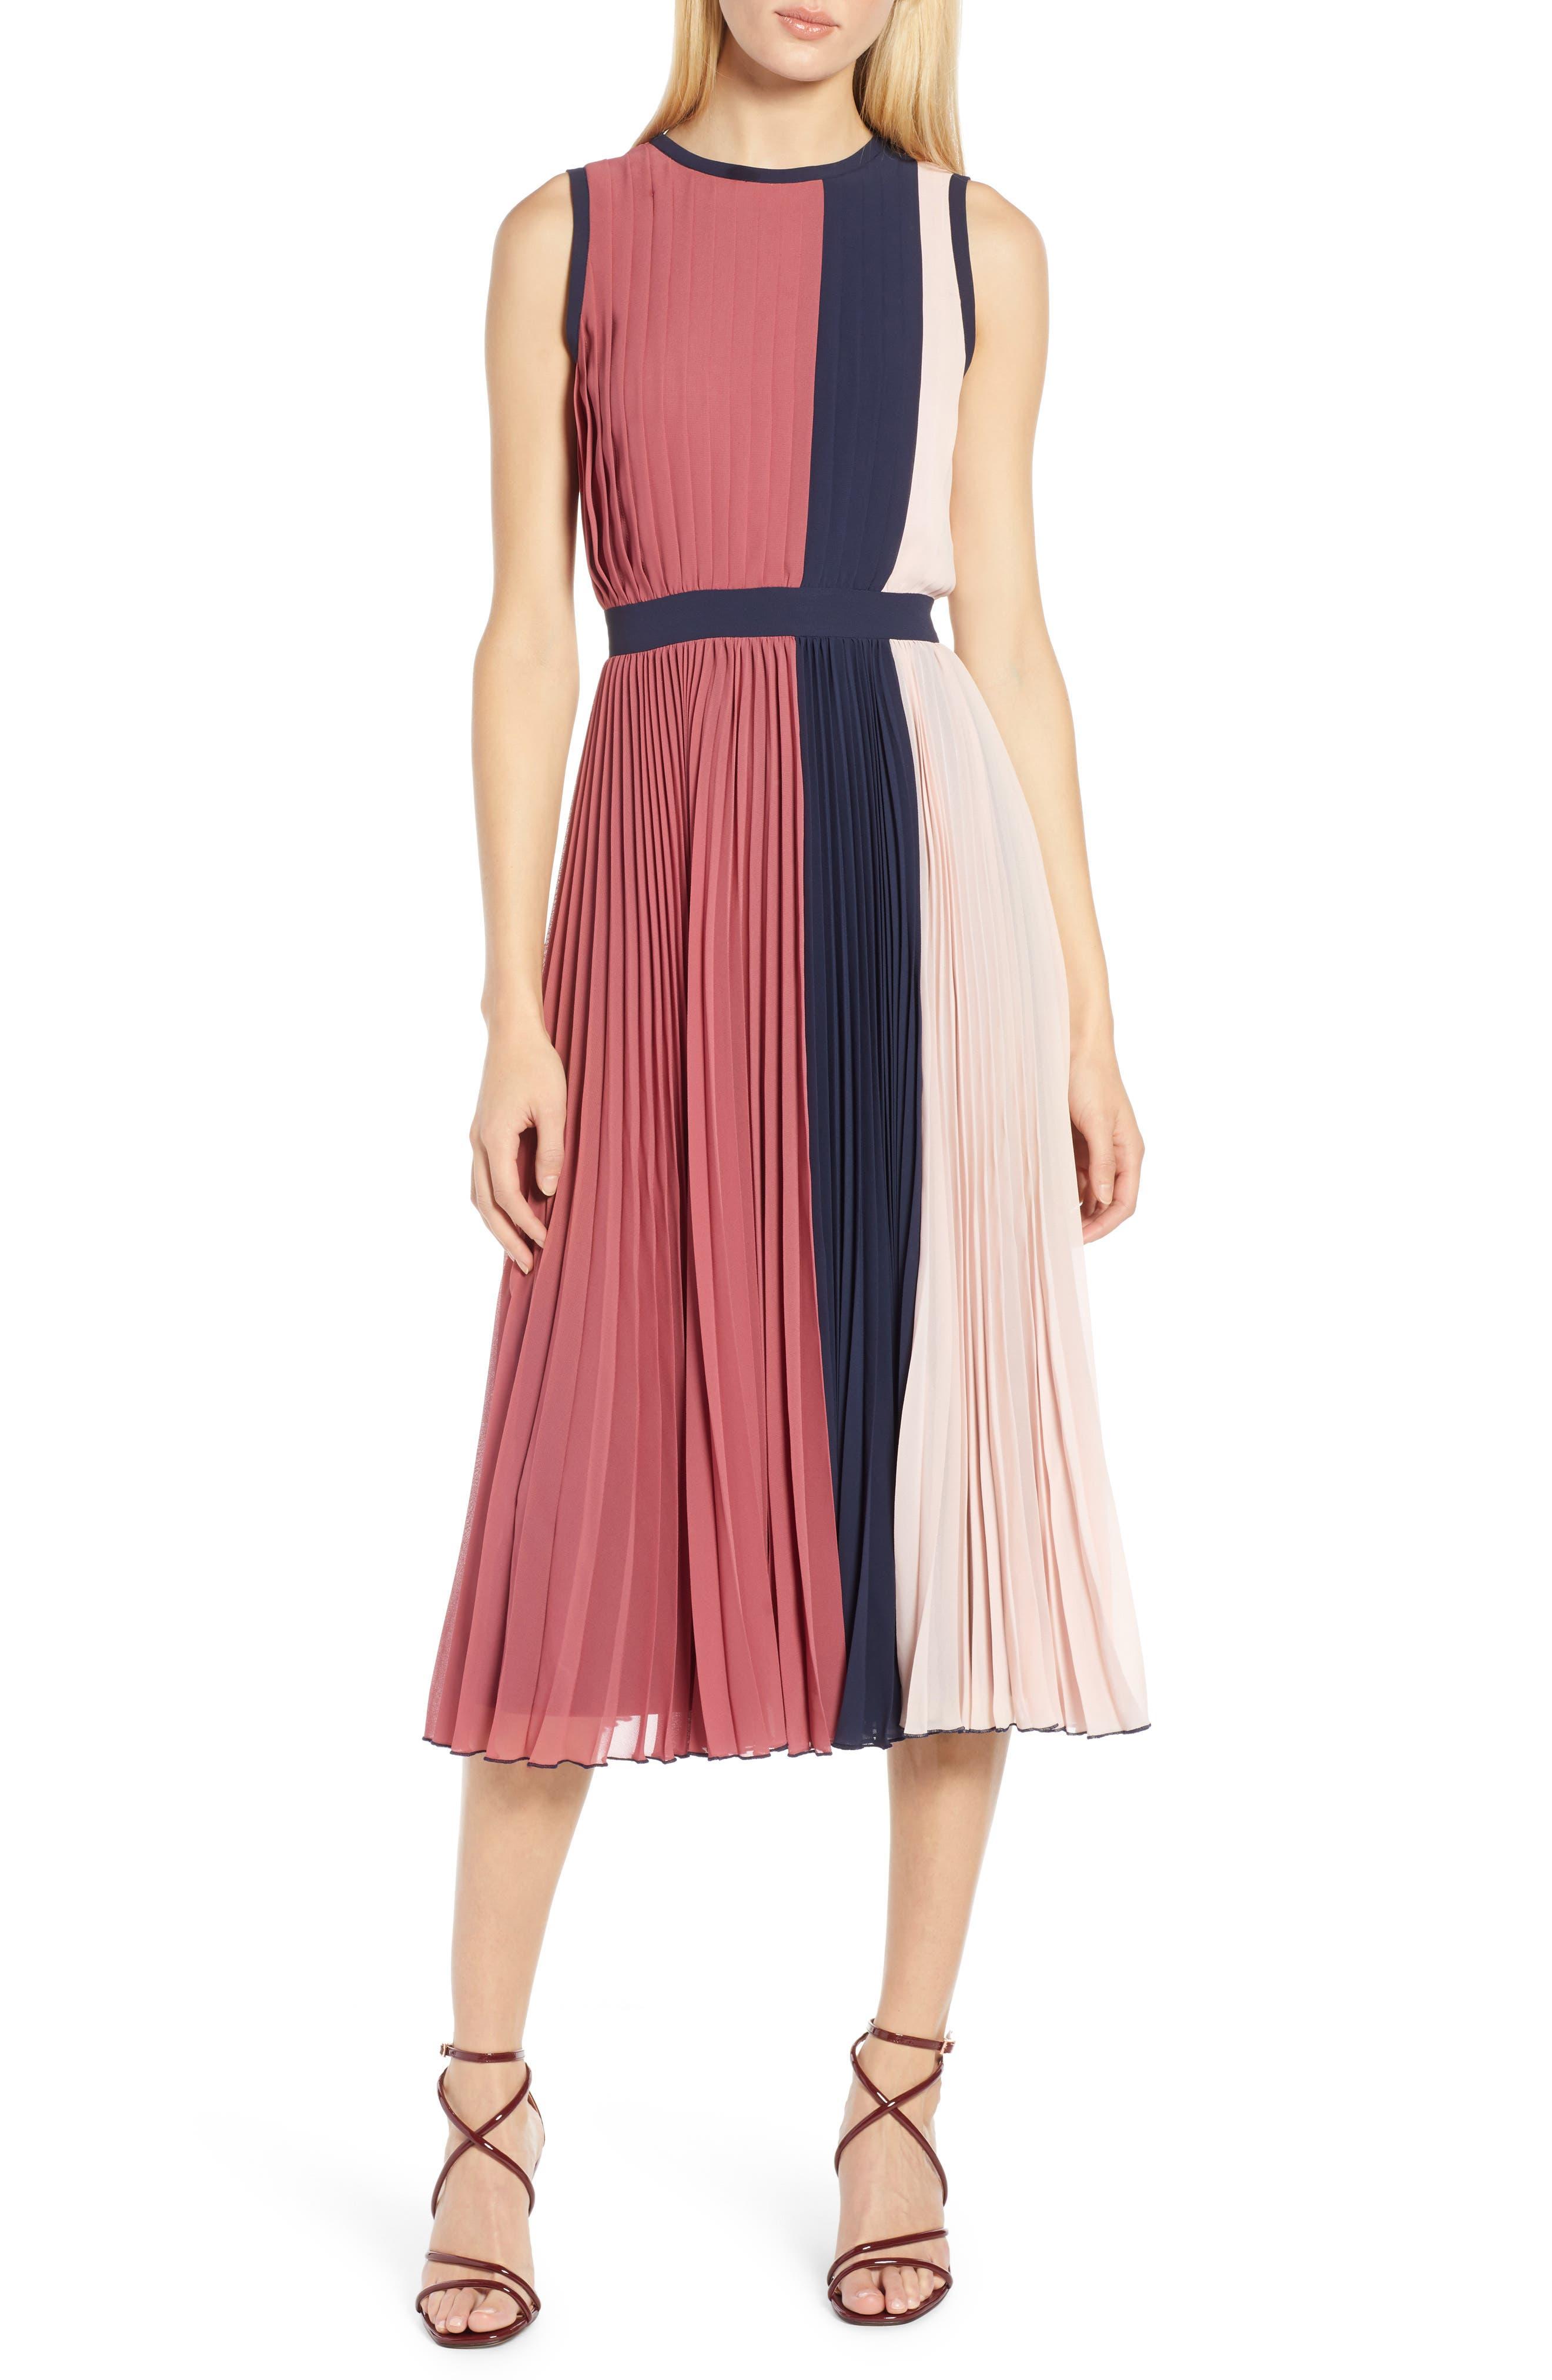 Halogen X Atlantic-Pacific Colorblock Pleated Midi Dress, (similar to 1) - Pink